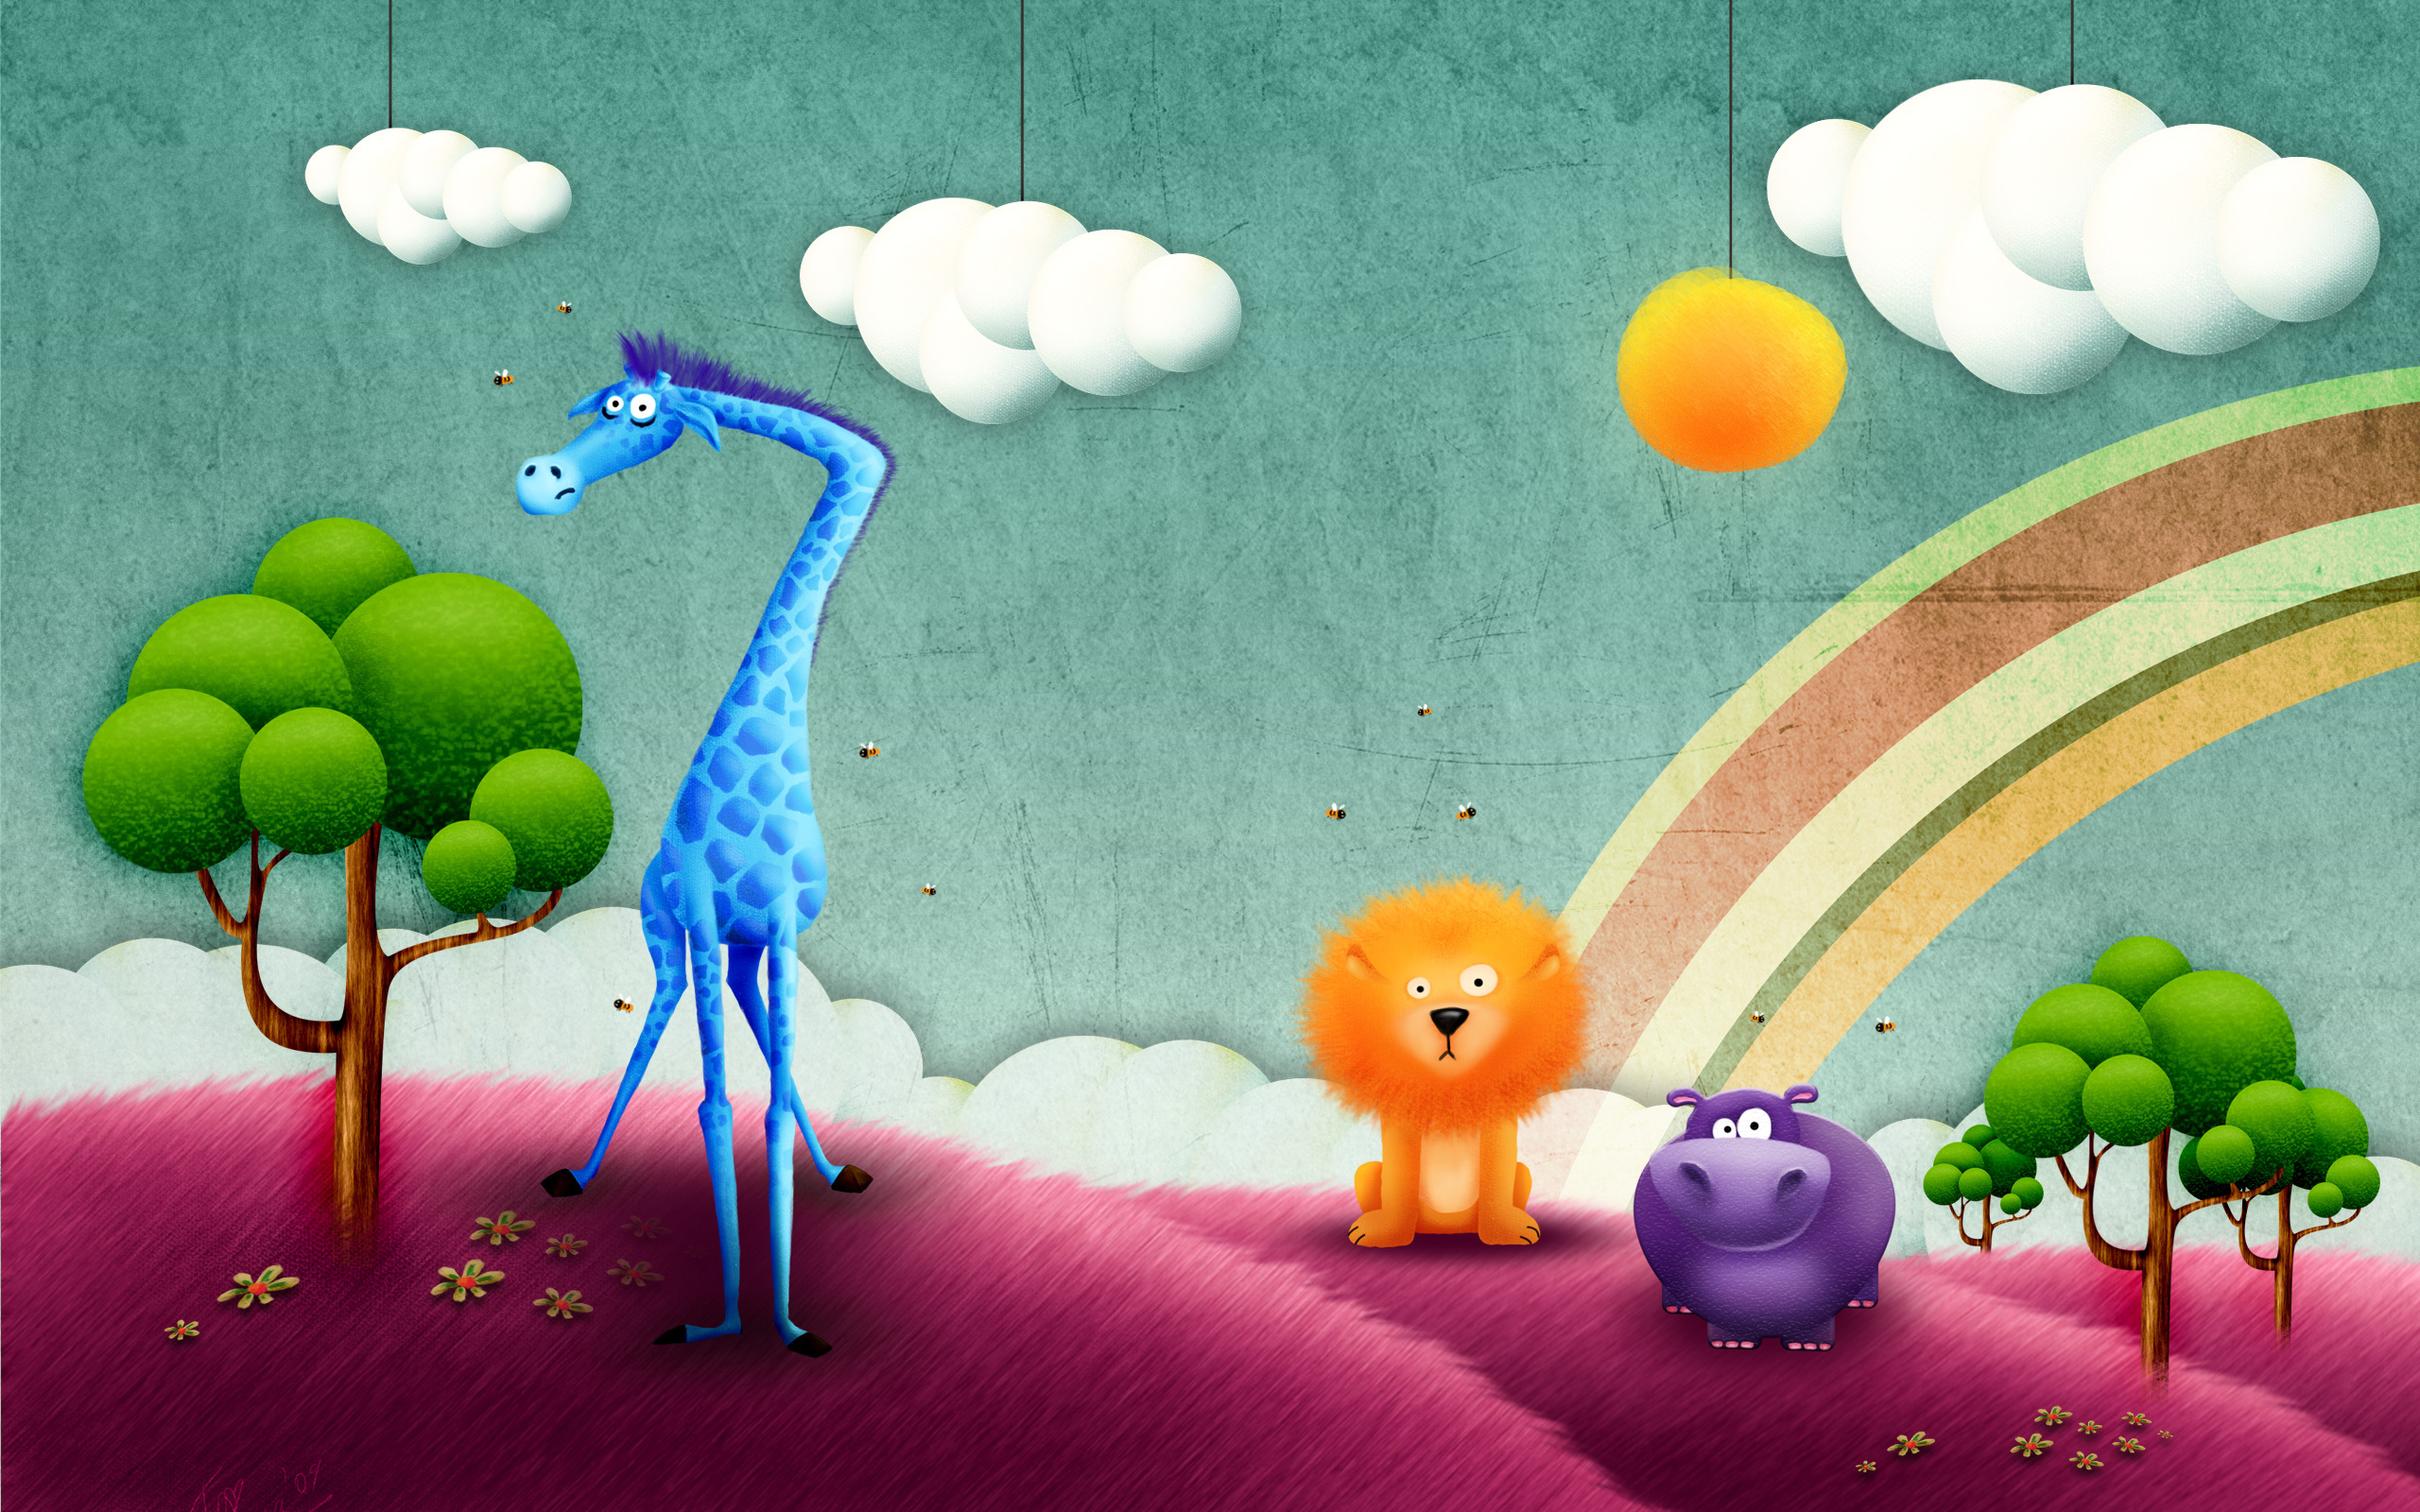 жираф рисунок  № 3522578 бесплатно